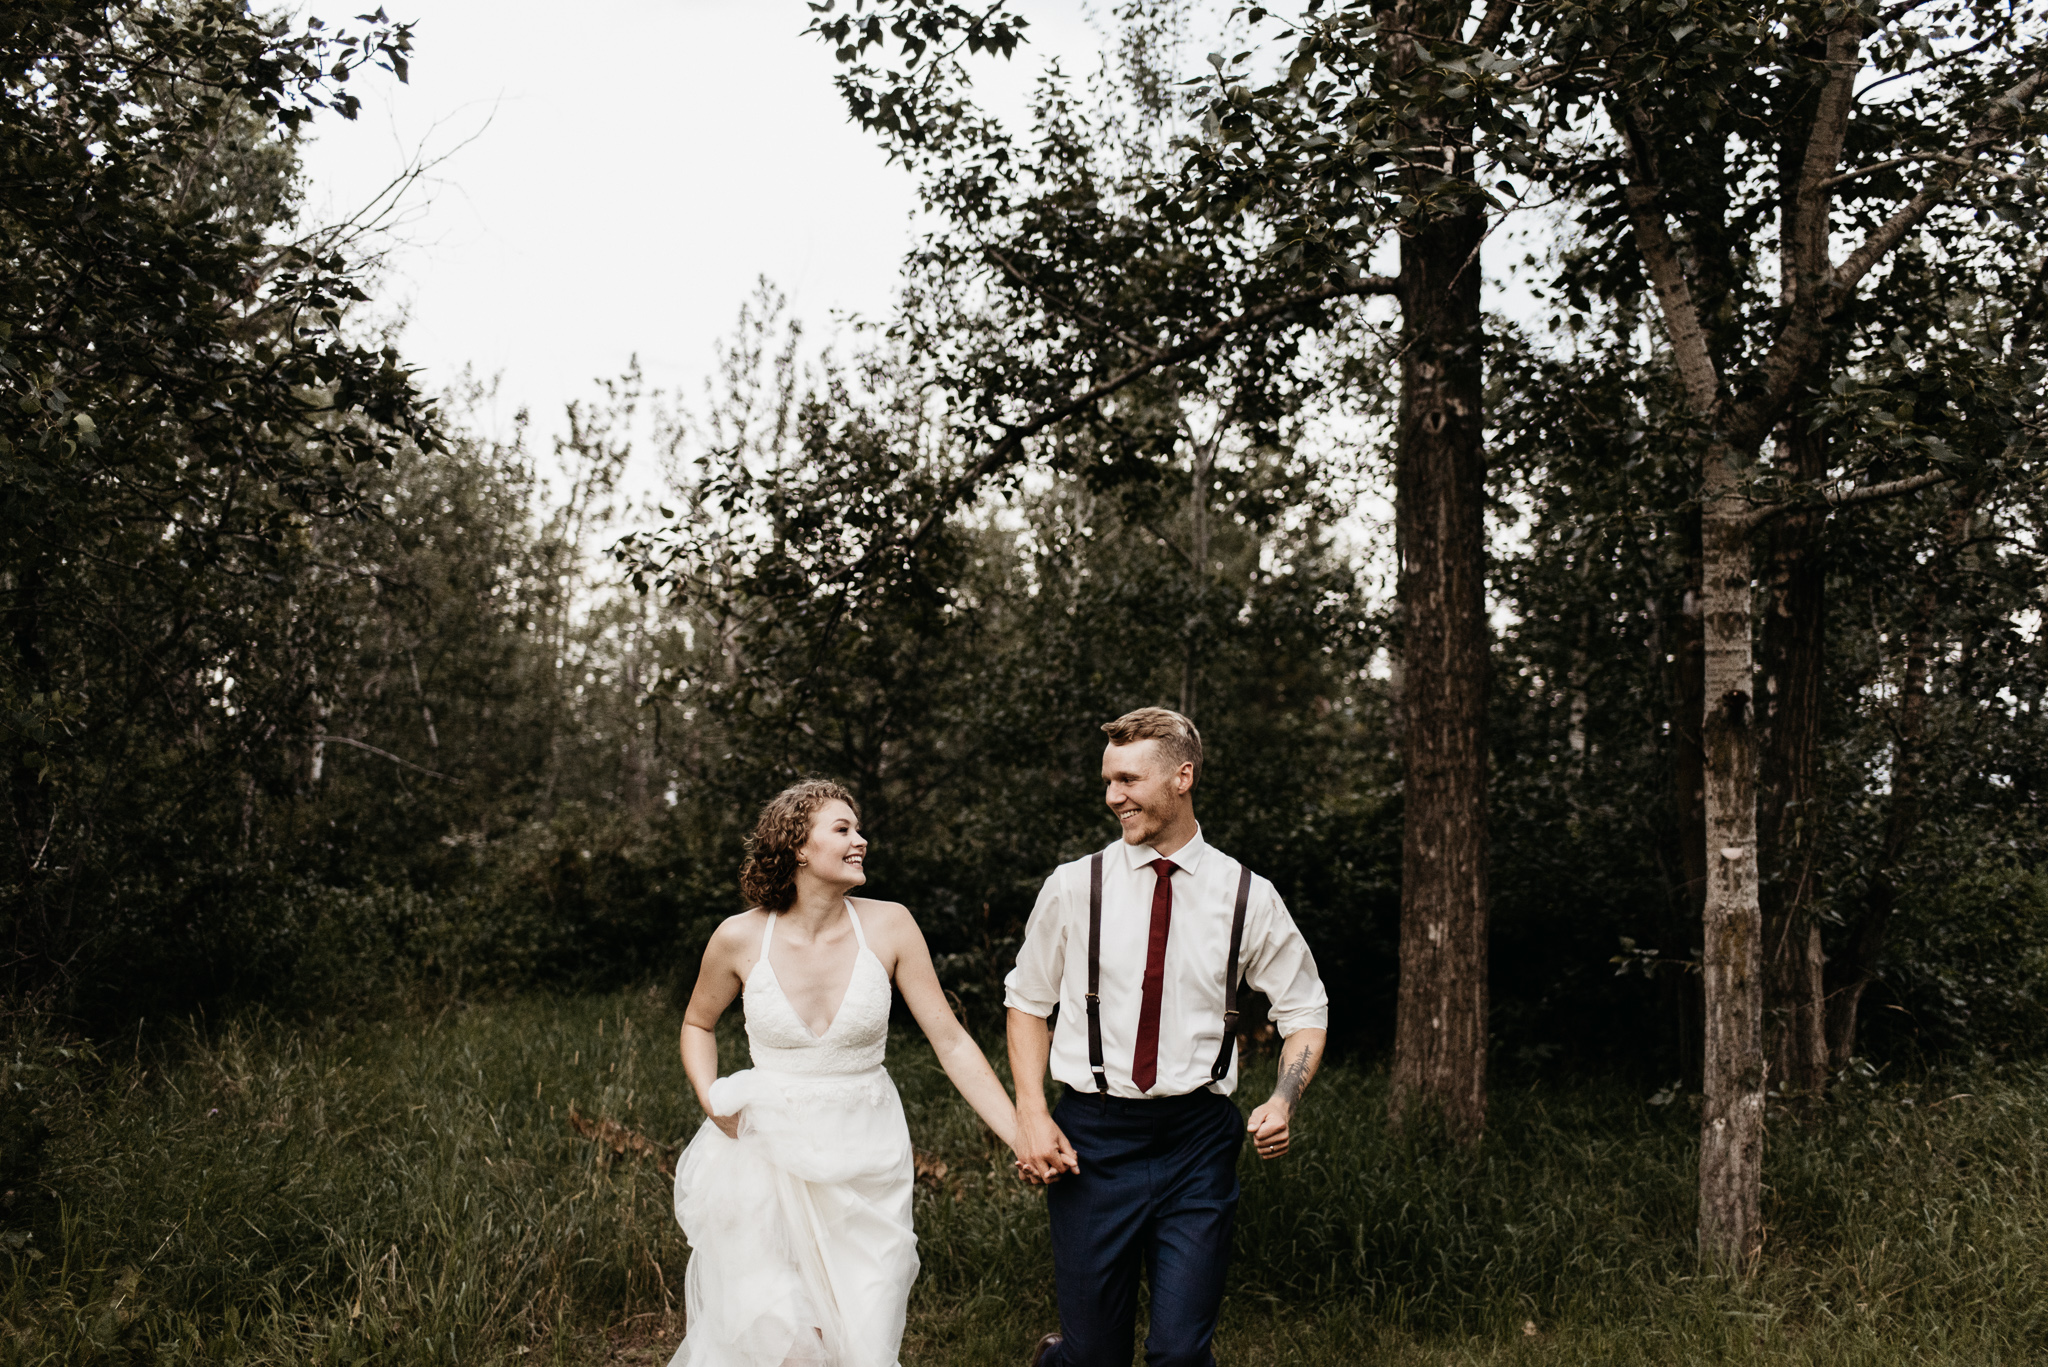 J&C-Weddingblog-118.jpg